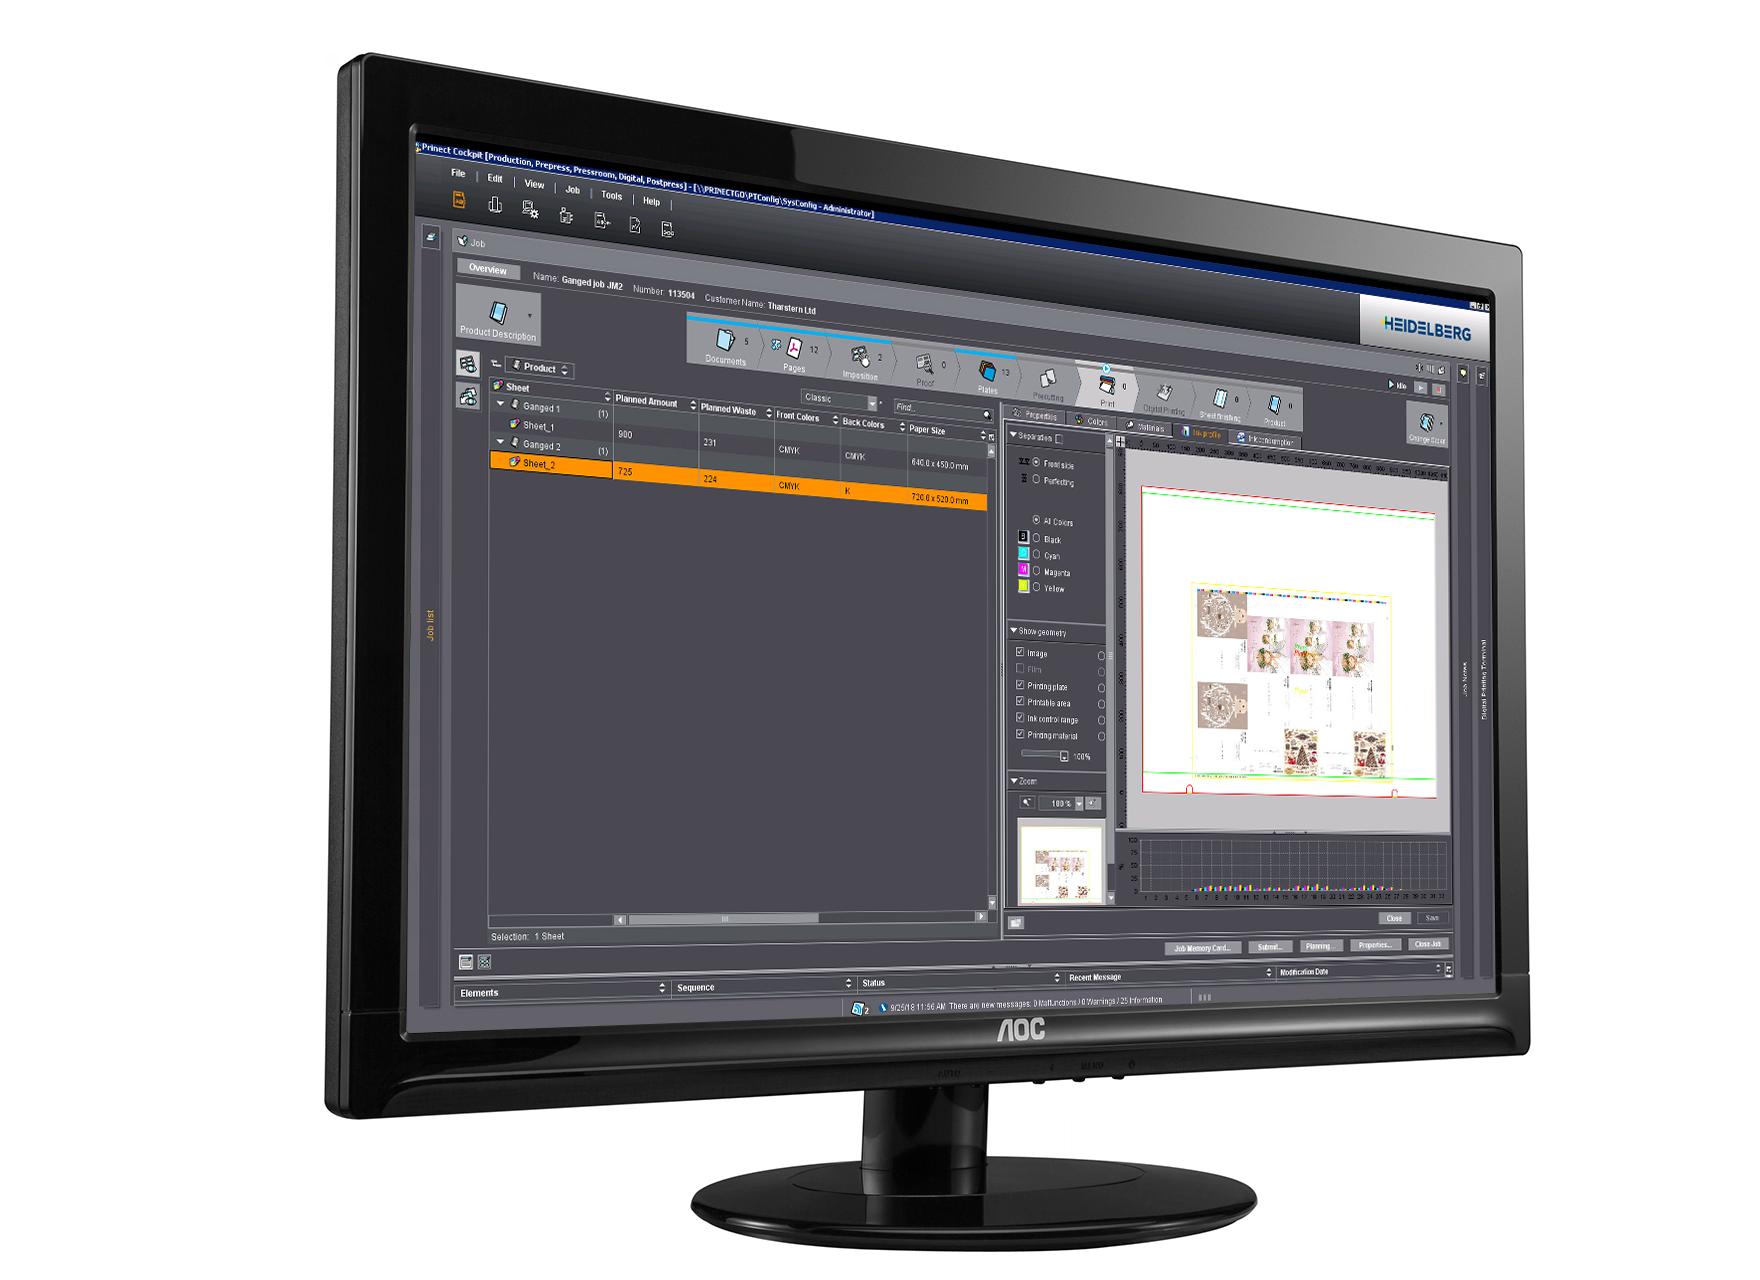 Tharstern Heidelberg Pressroom Manager Integration